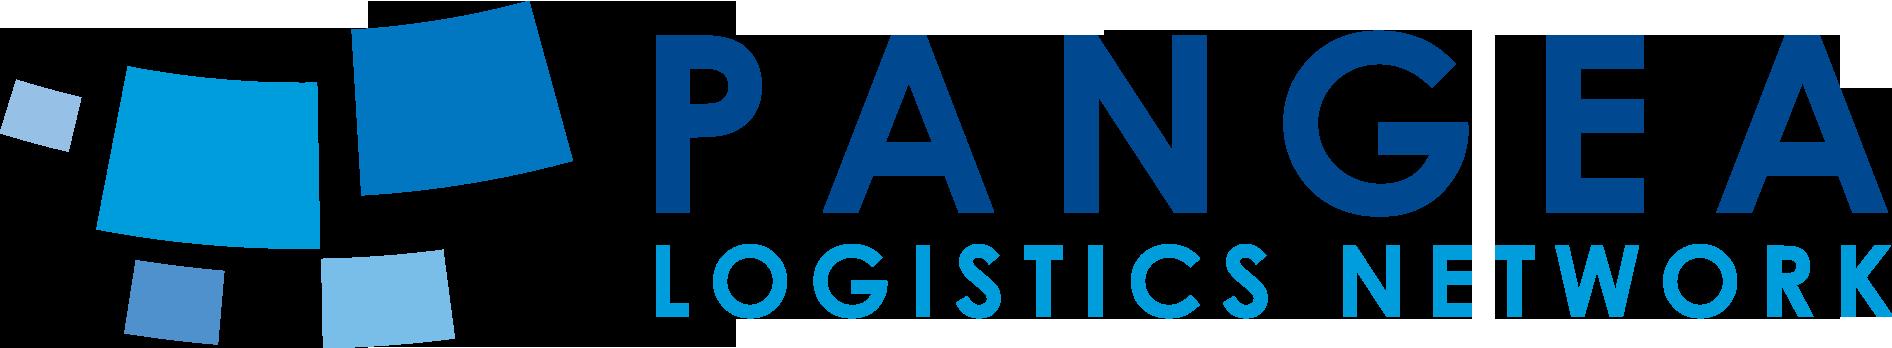 Pangea Logistics Network Ltd.  www.pangea-network.com